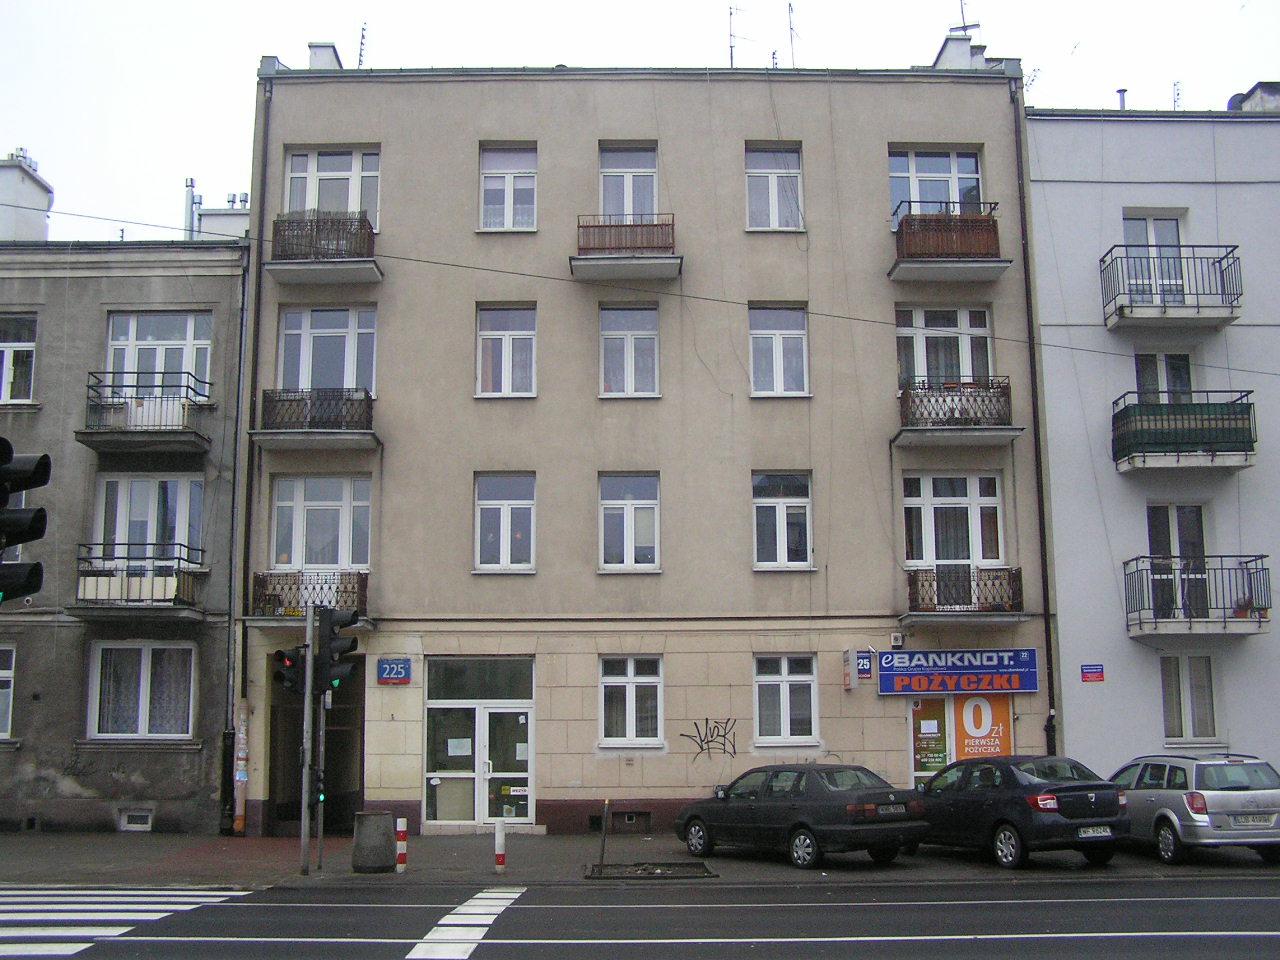 Grochowska 225